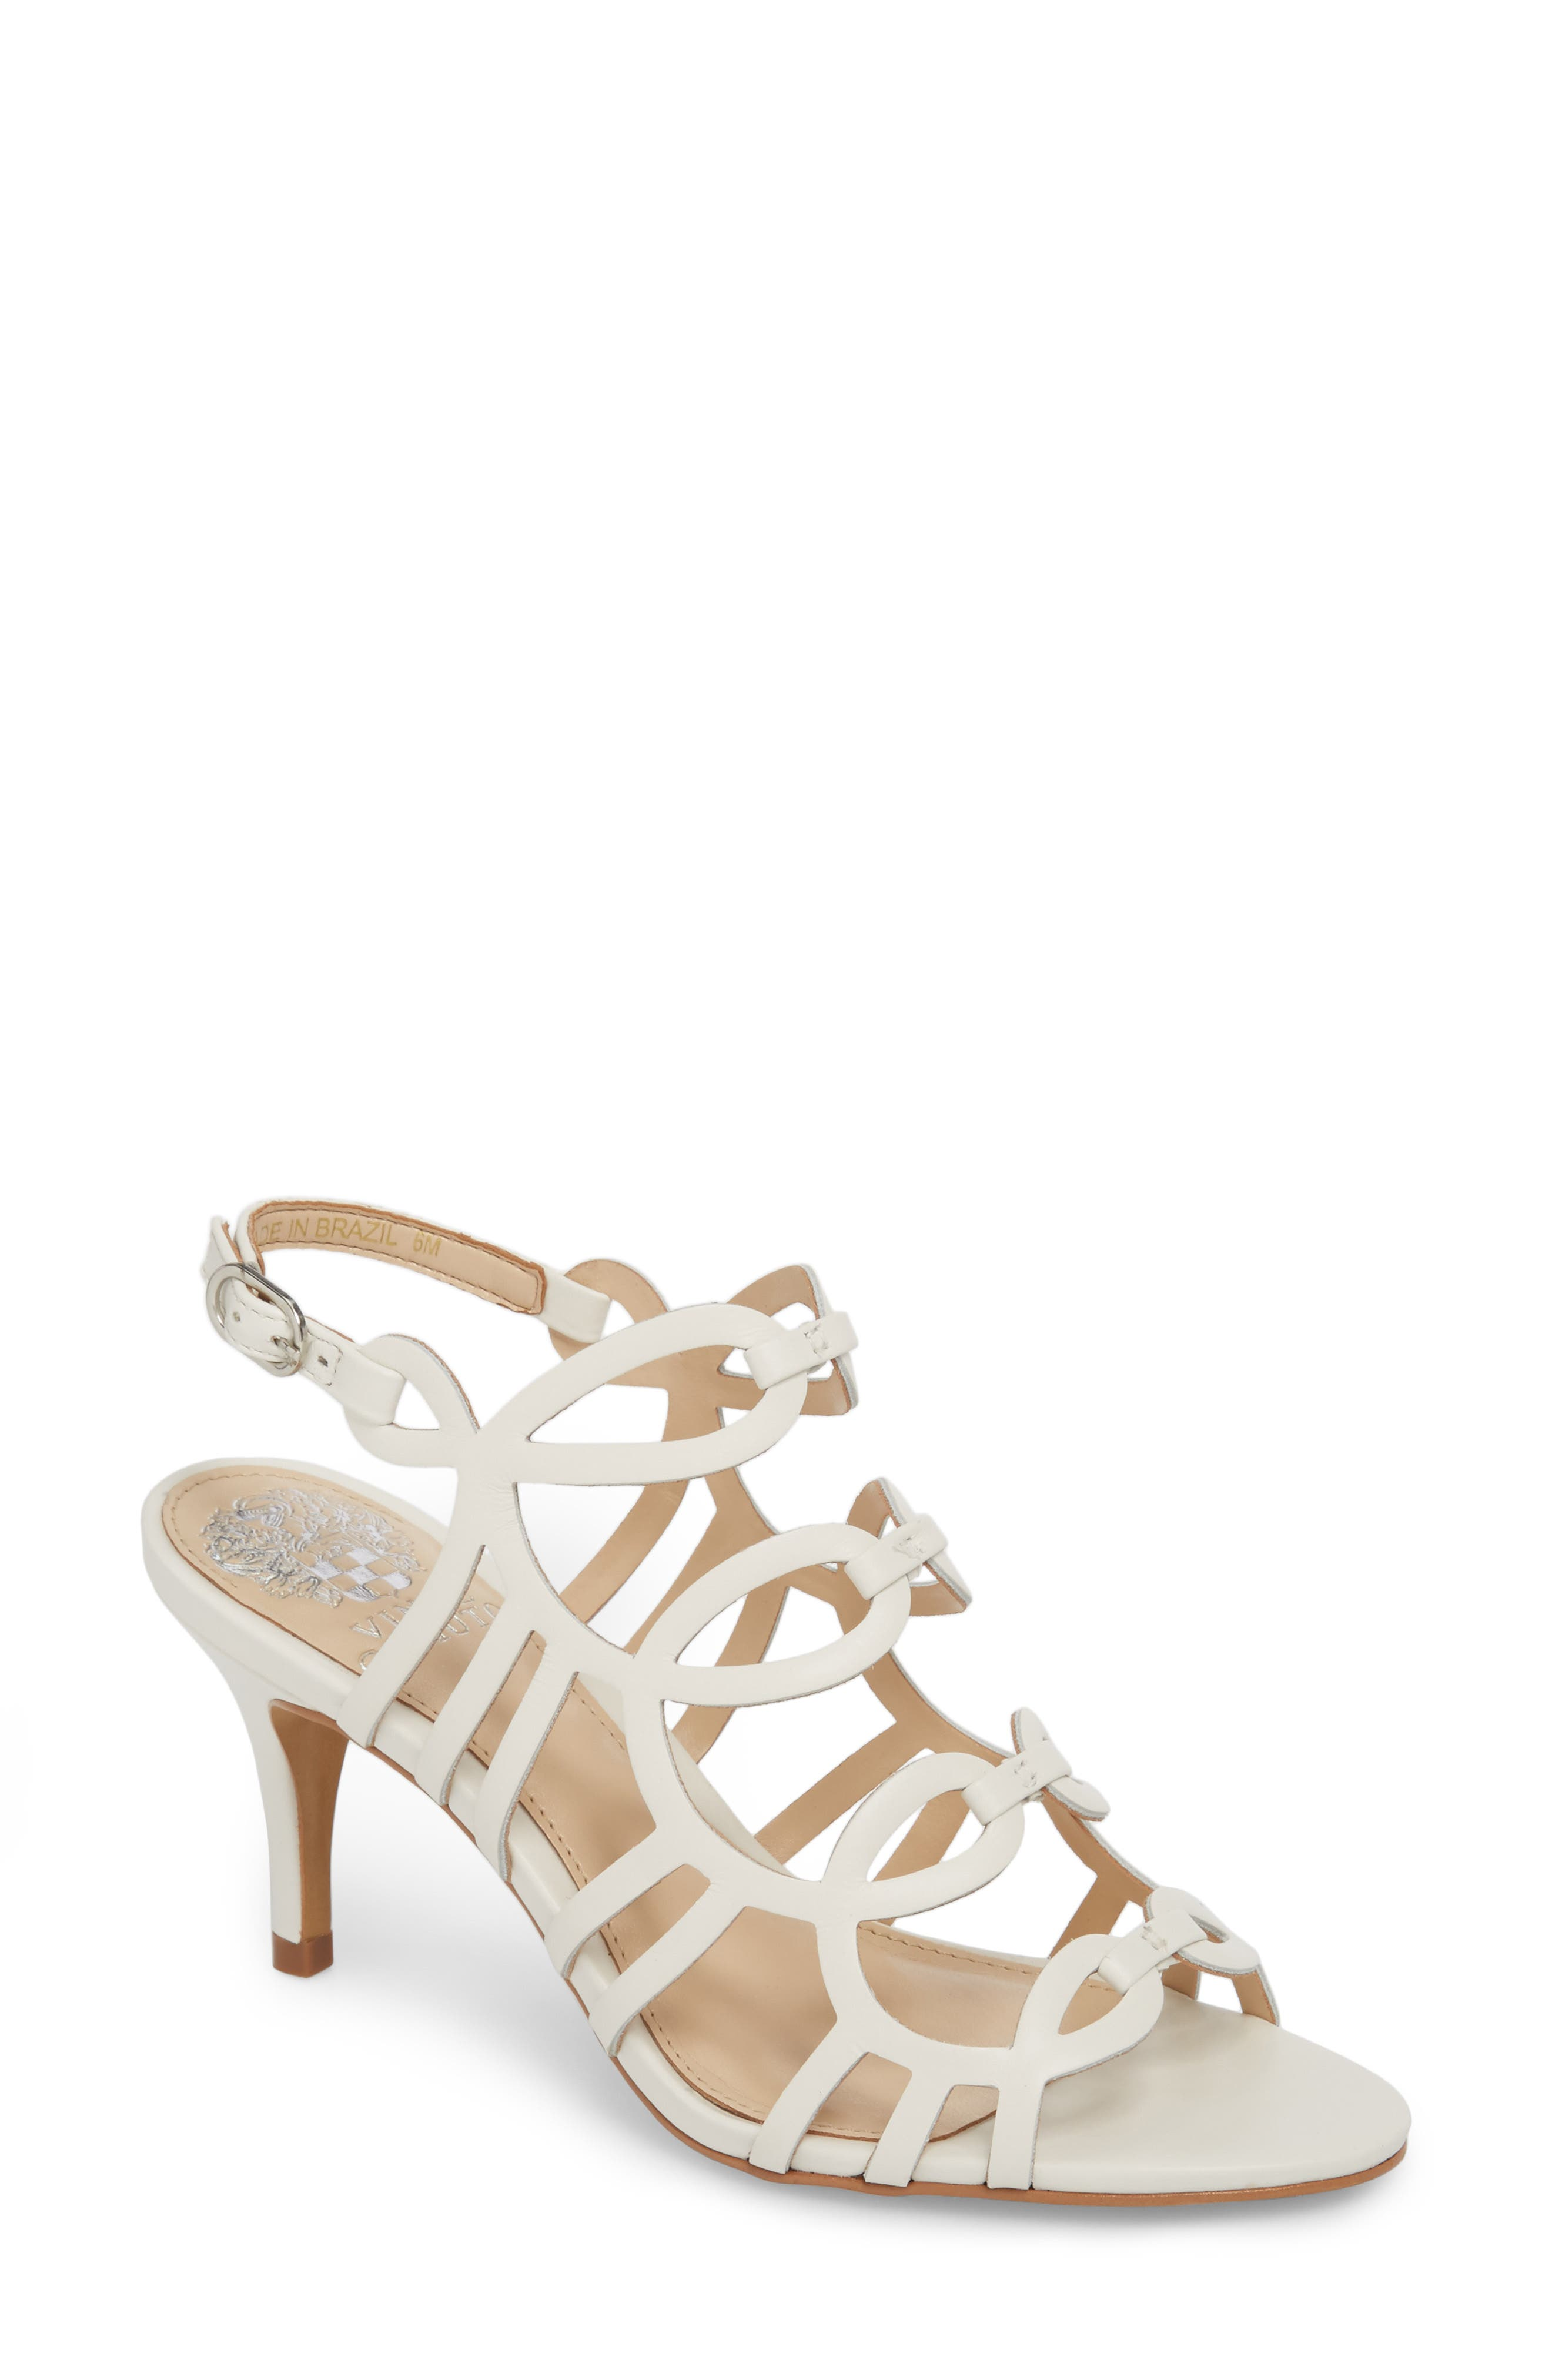 Petina Sandal,                         Main,                         color, White Leather